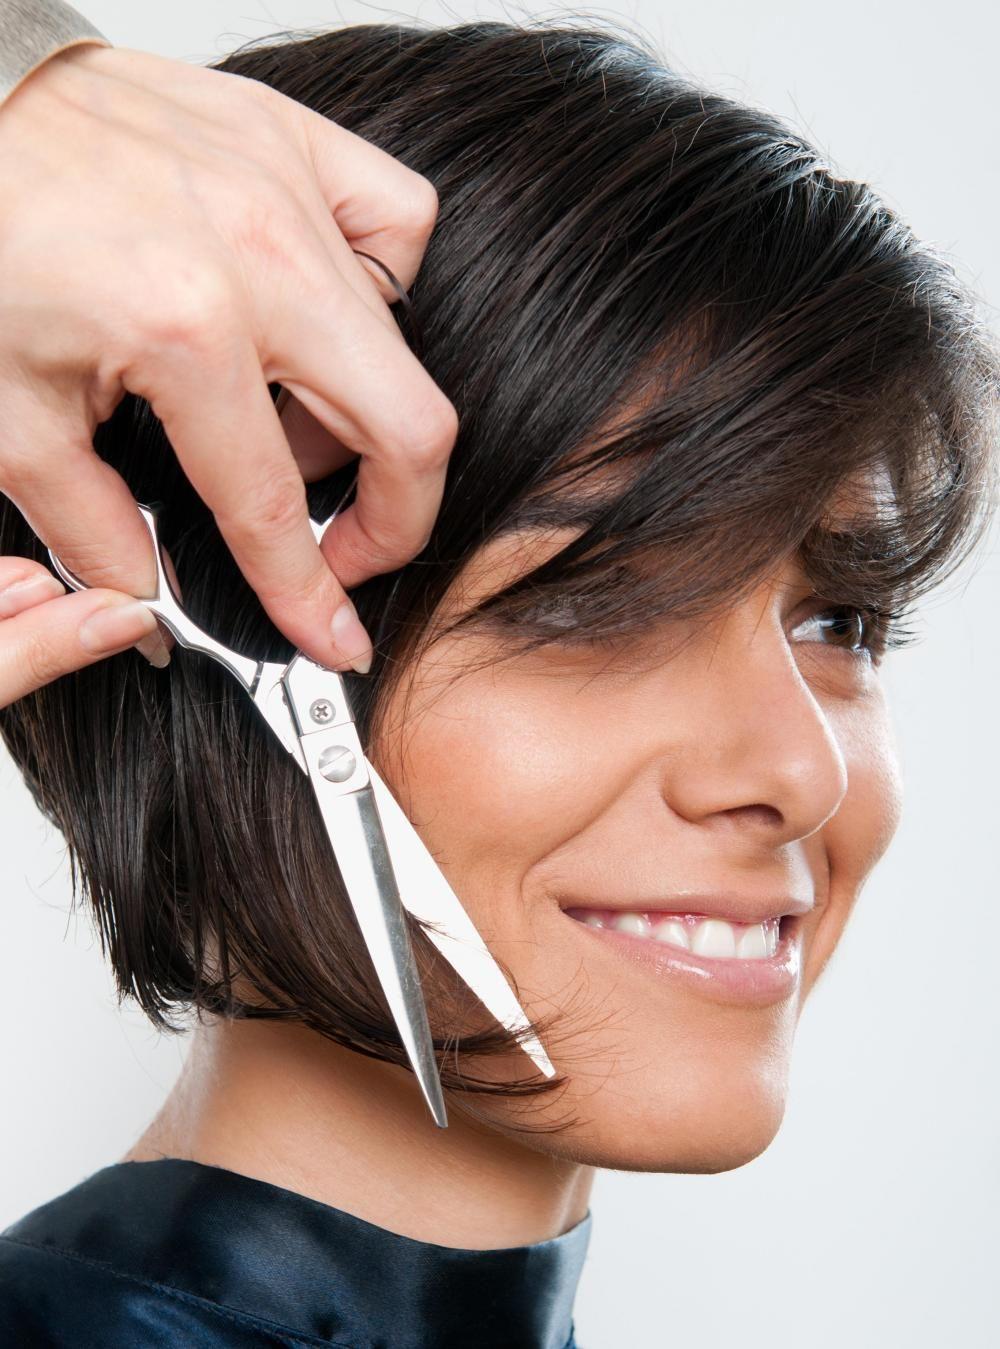 Fantastic 10 Best Images About Hairstylesy On Pinterest Shorts Older Short Hairstyles Gunalazisus